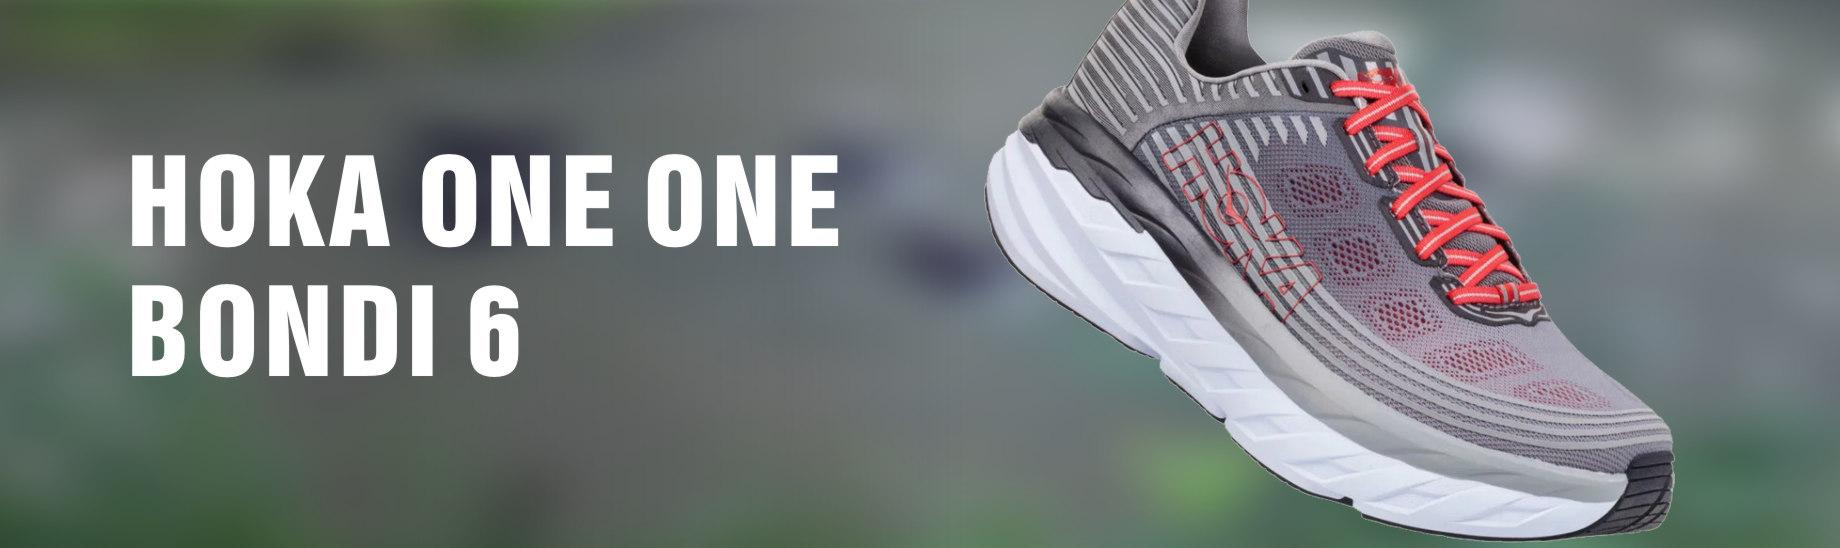 ae0eac452bad7 Bežecká obuv a oblečenie | RUNNING STORE